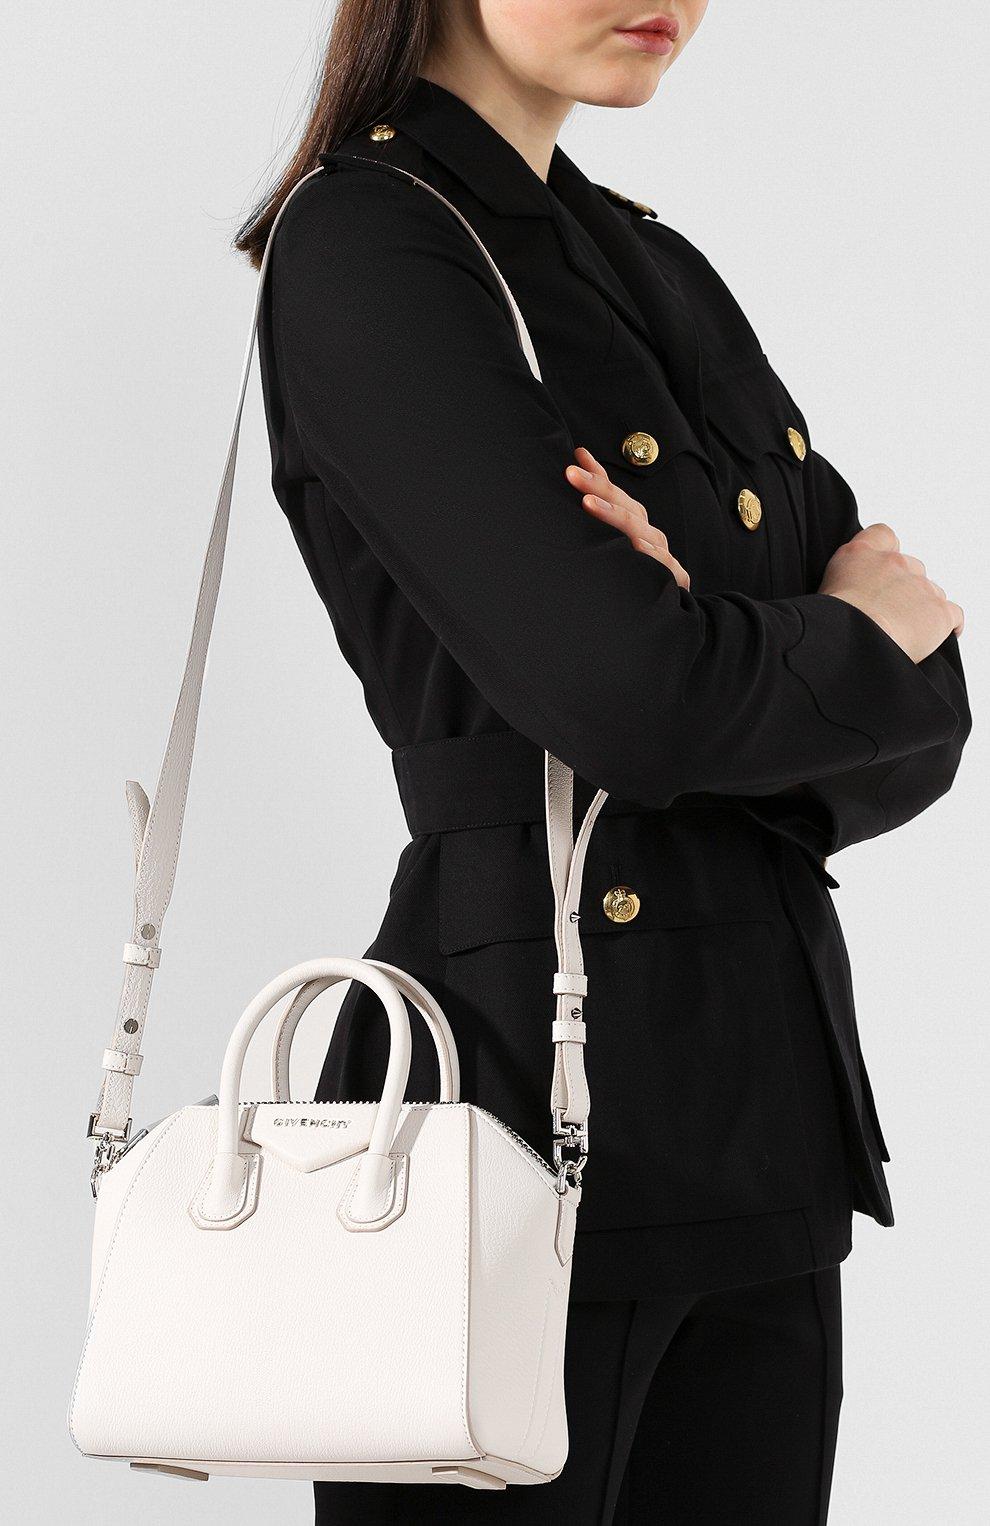 Сумка Antigona mini Givenchy белая цвета | Фото №5